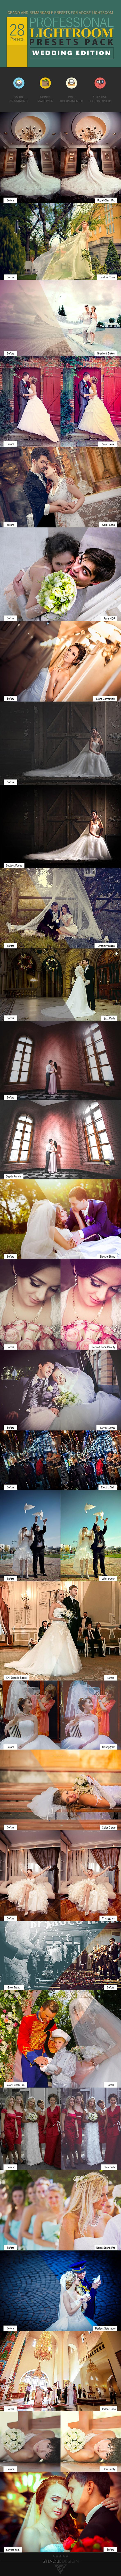 Wedding Edition - 28 Professional Lightroom Preset - Wedding Lightroom Presets